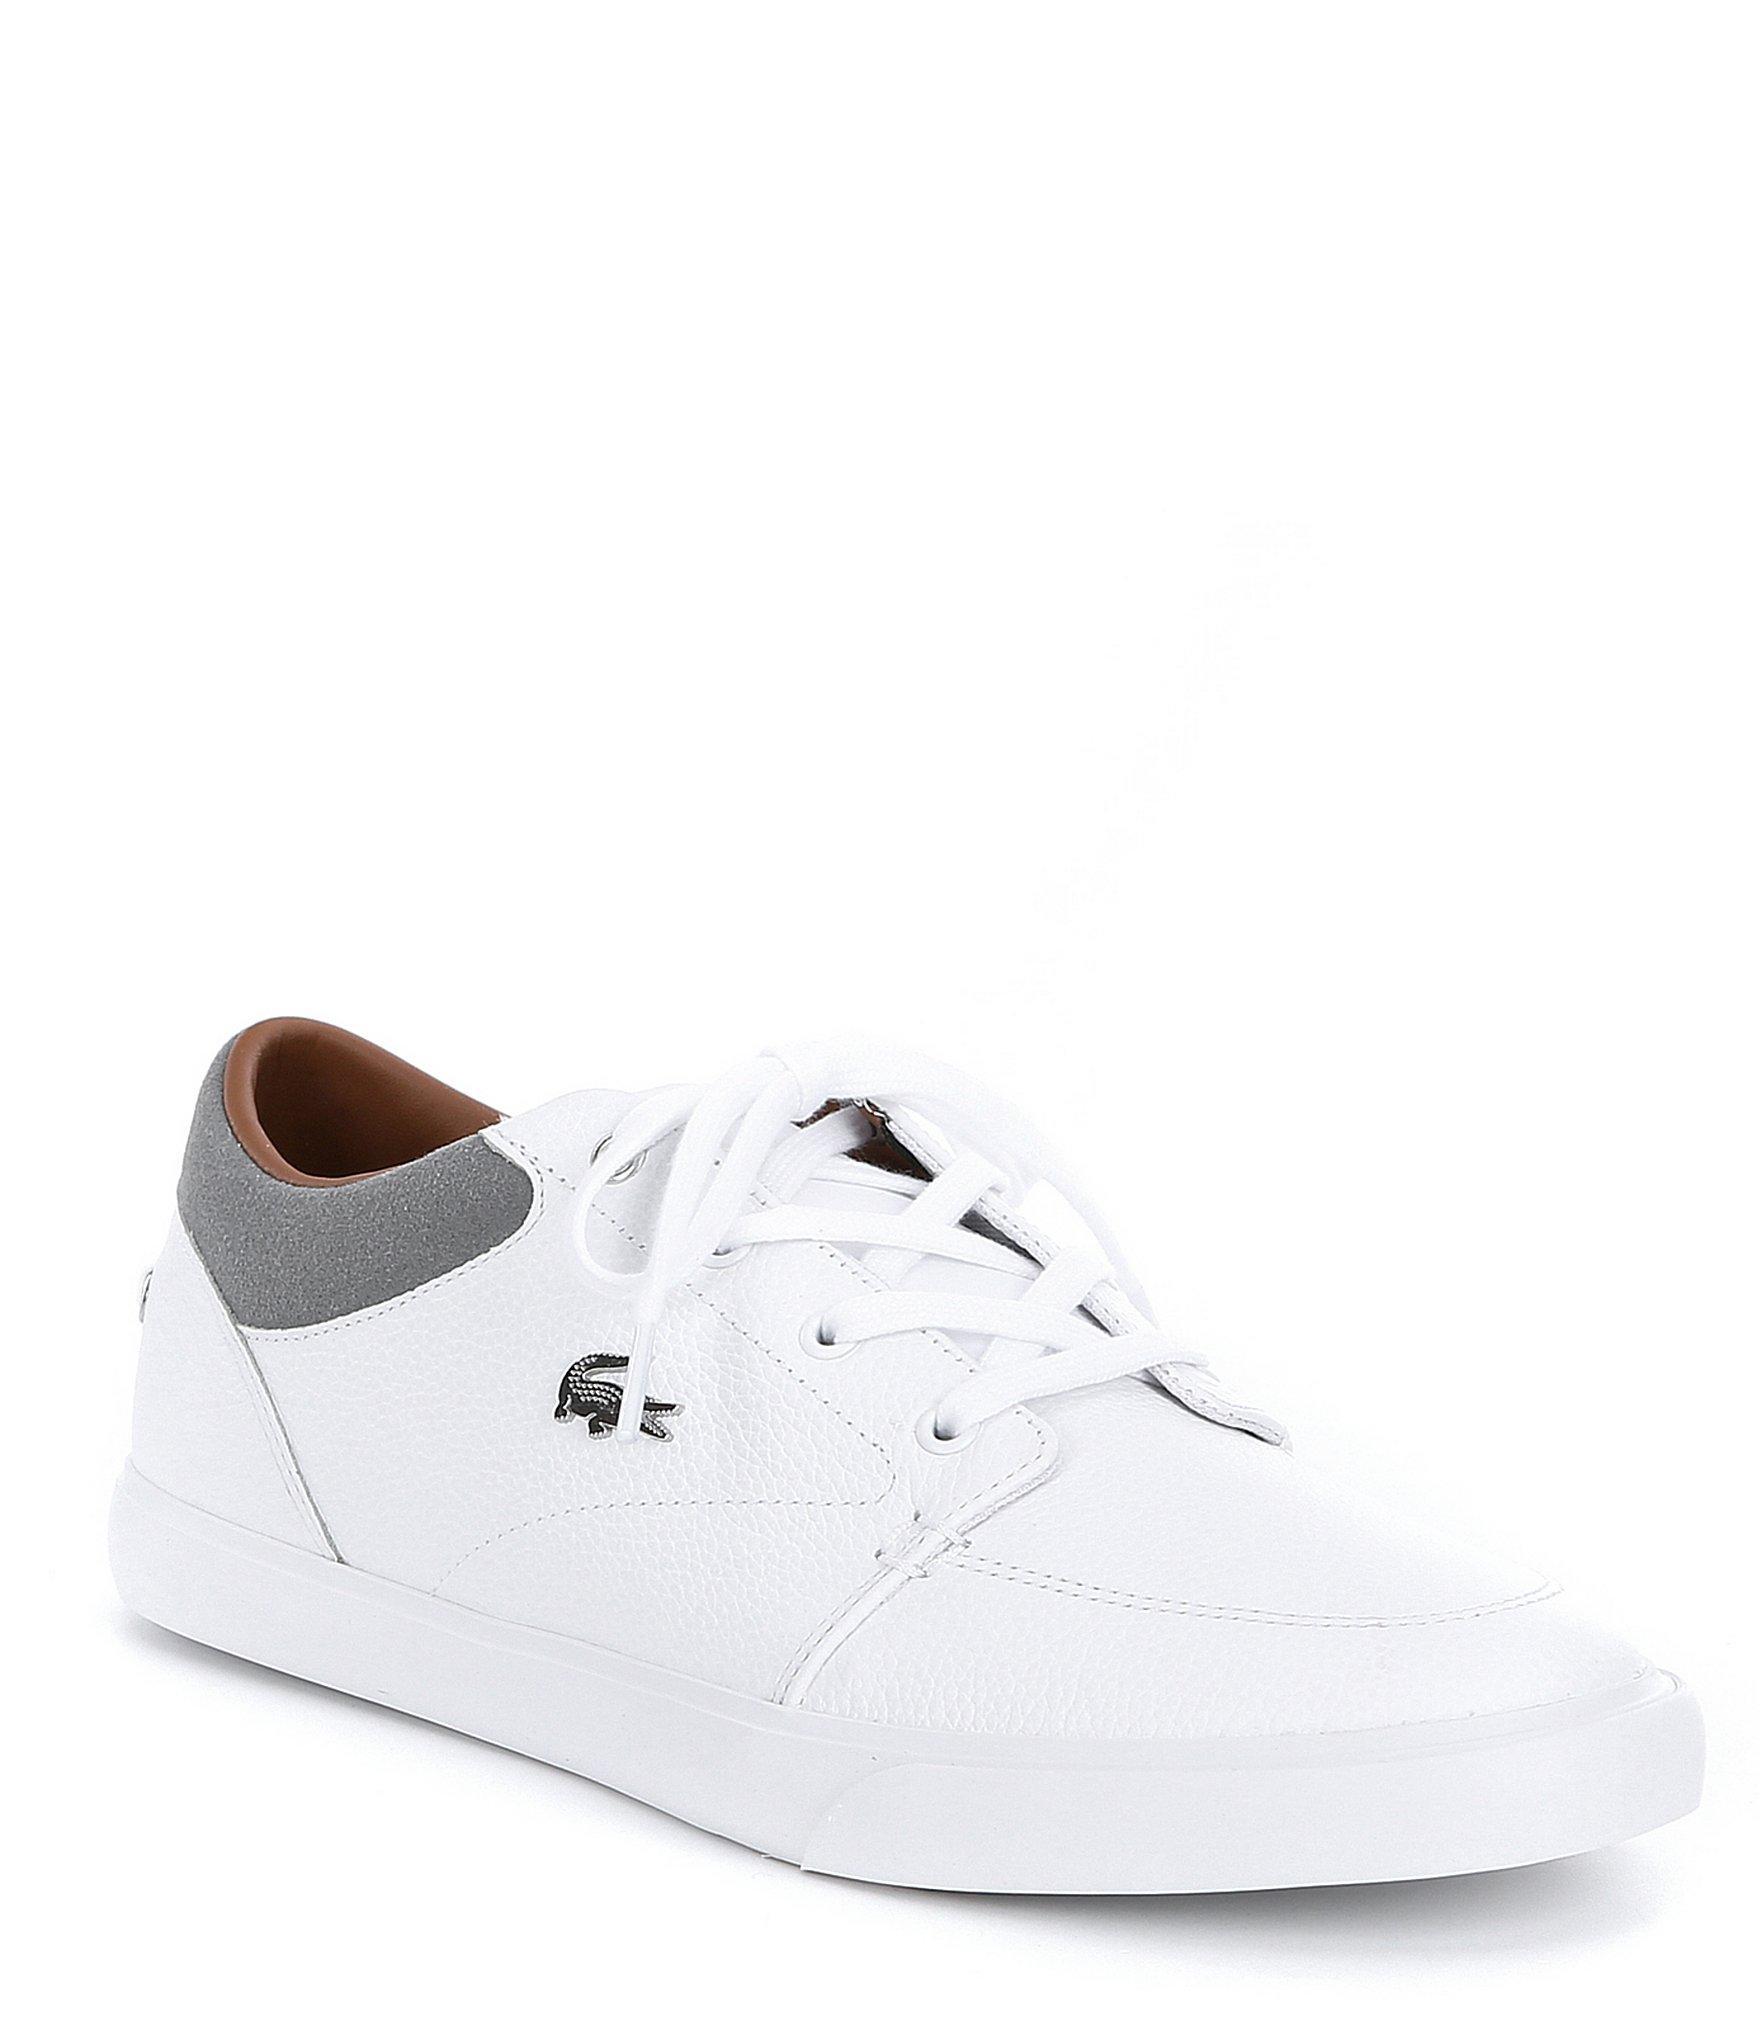 687fb1c4c Lyst - Lacoste Men s Bayliss 118 Sneakers in Gray for Men